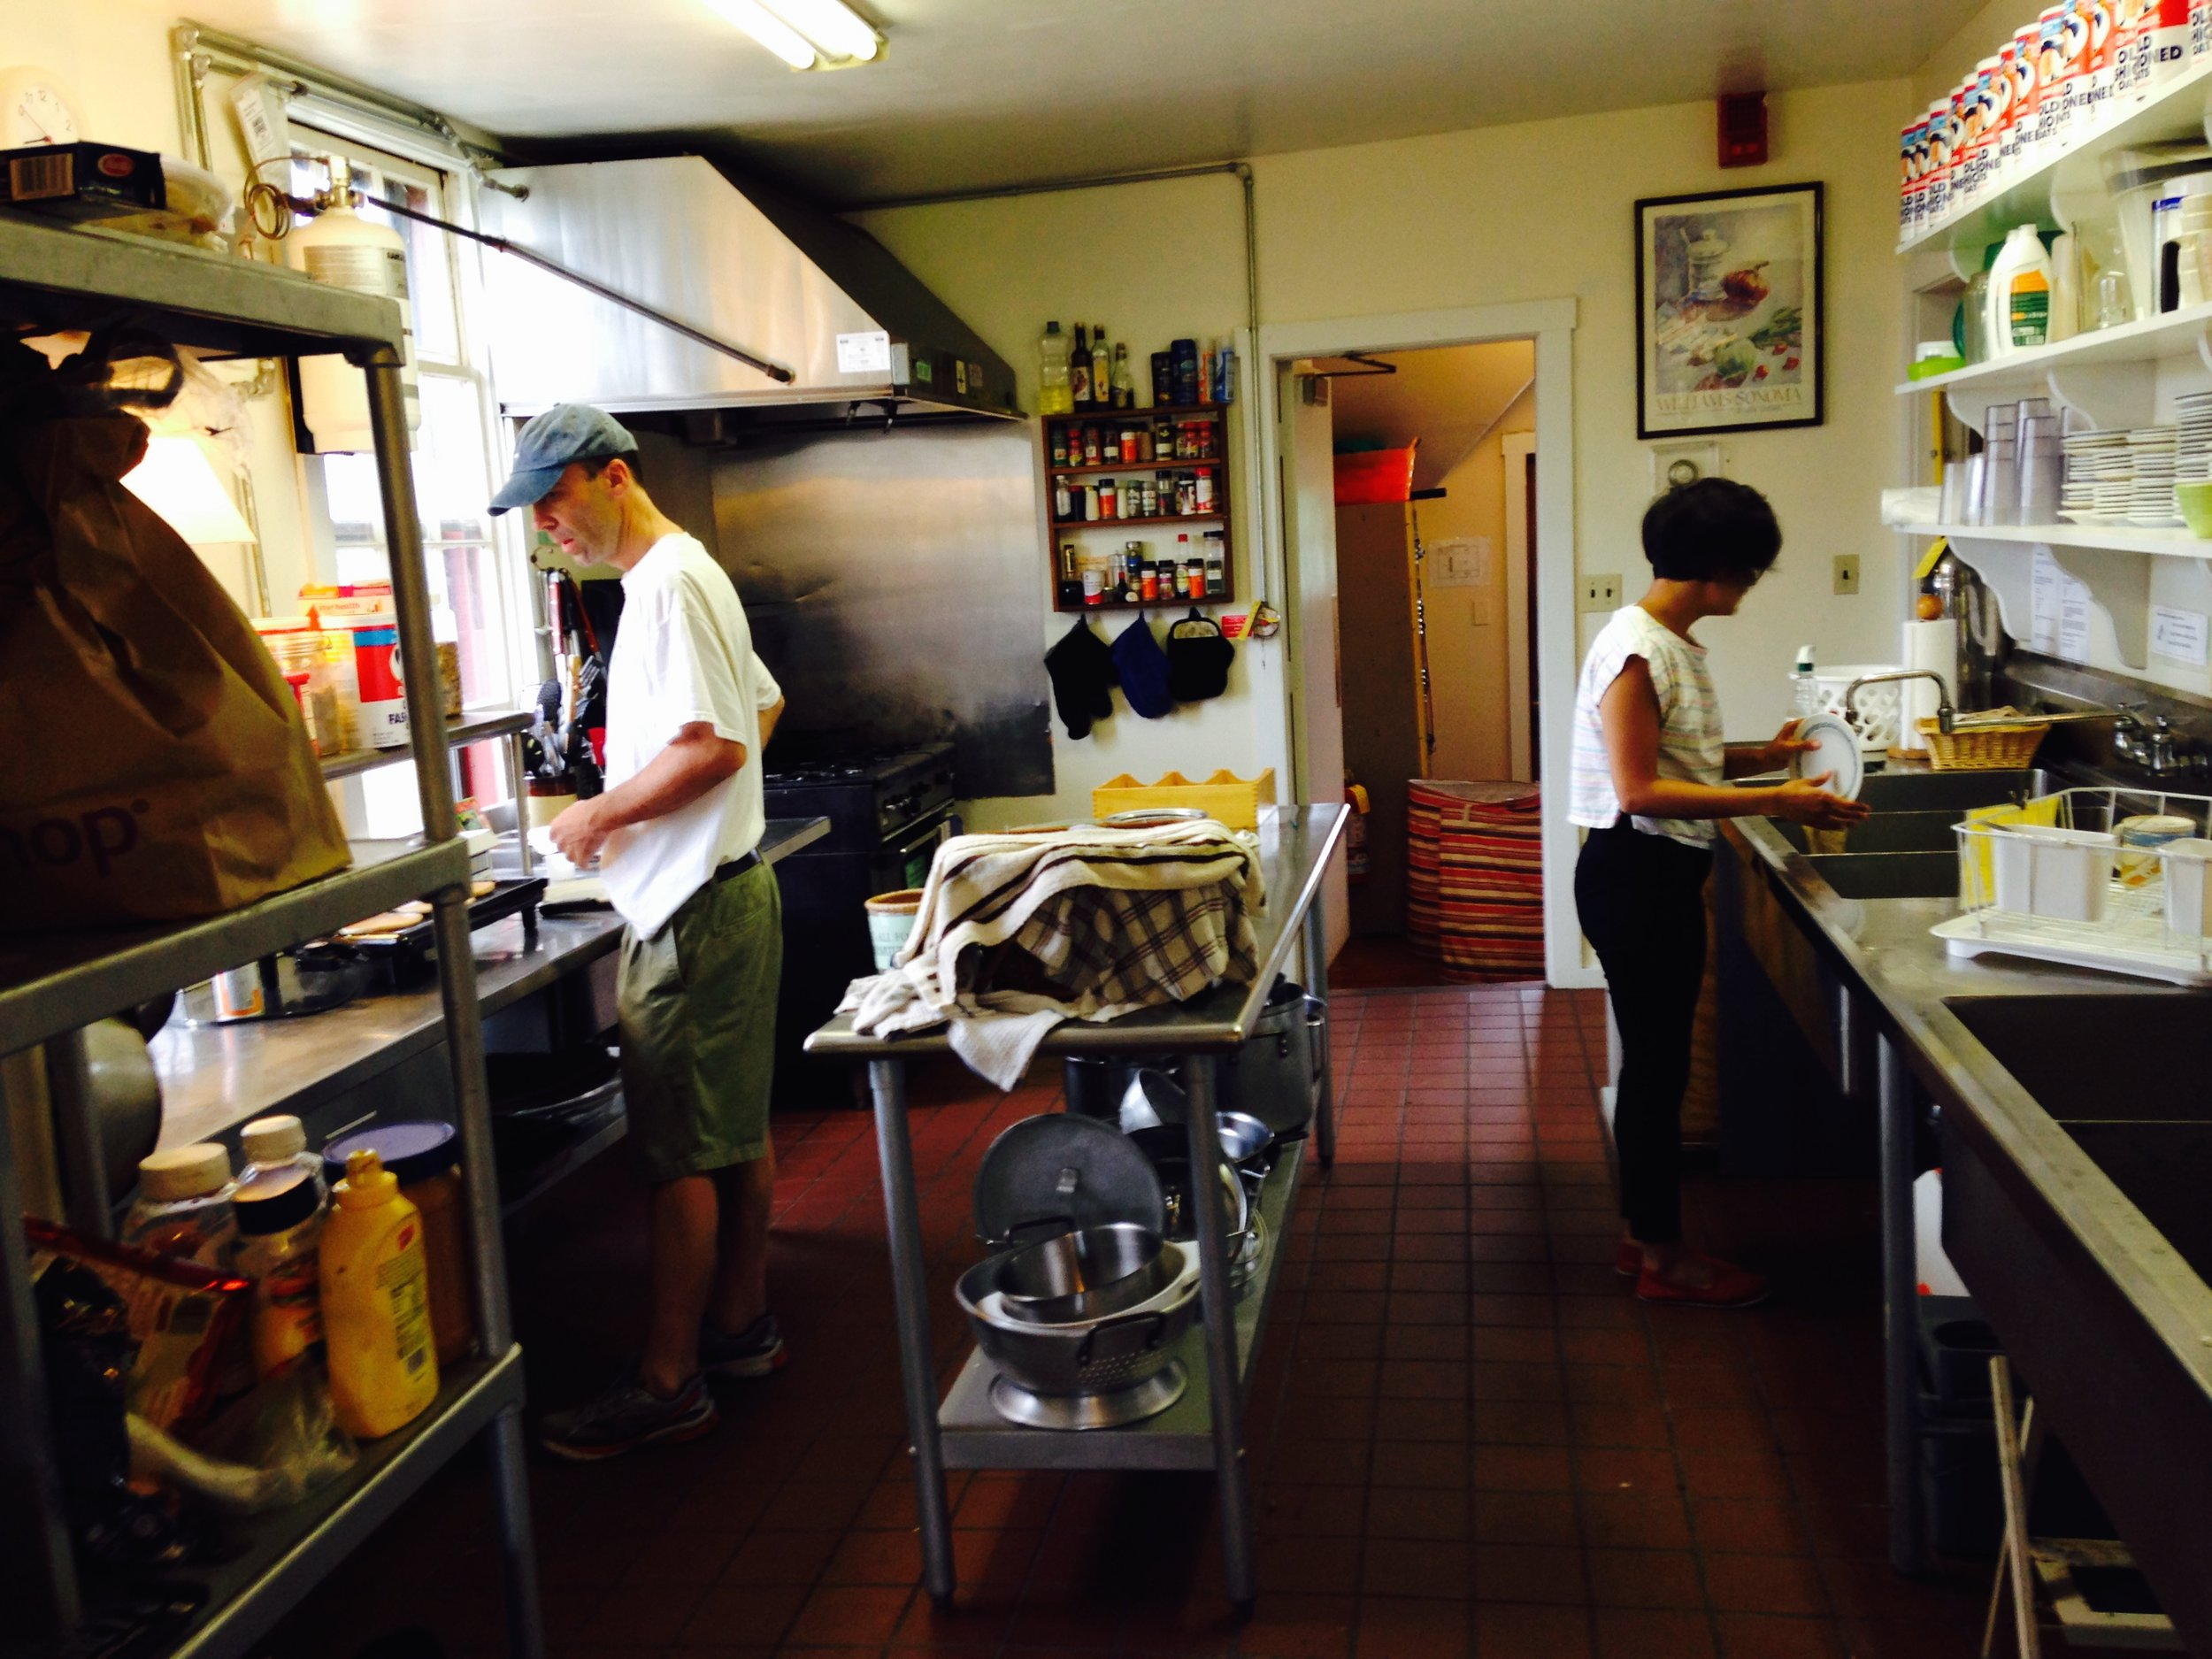 HI hostel kitchen on Nantucket